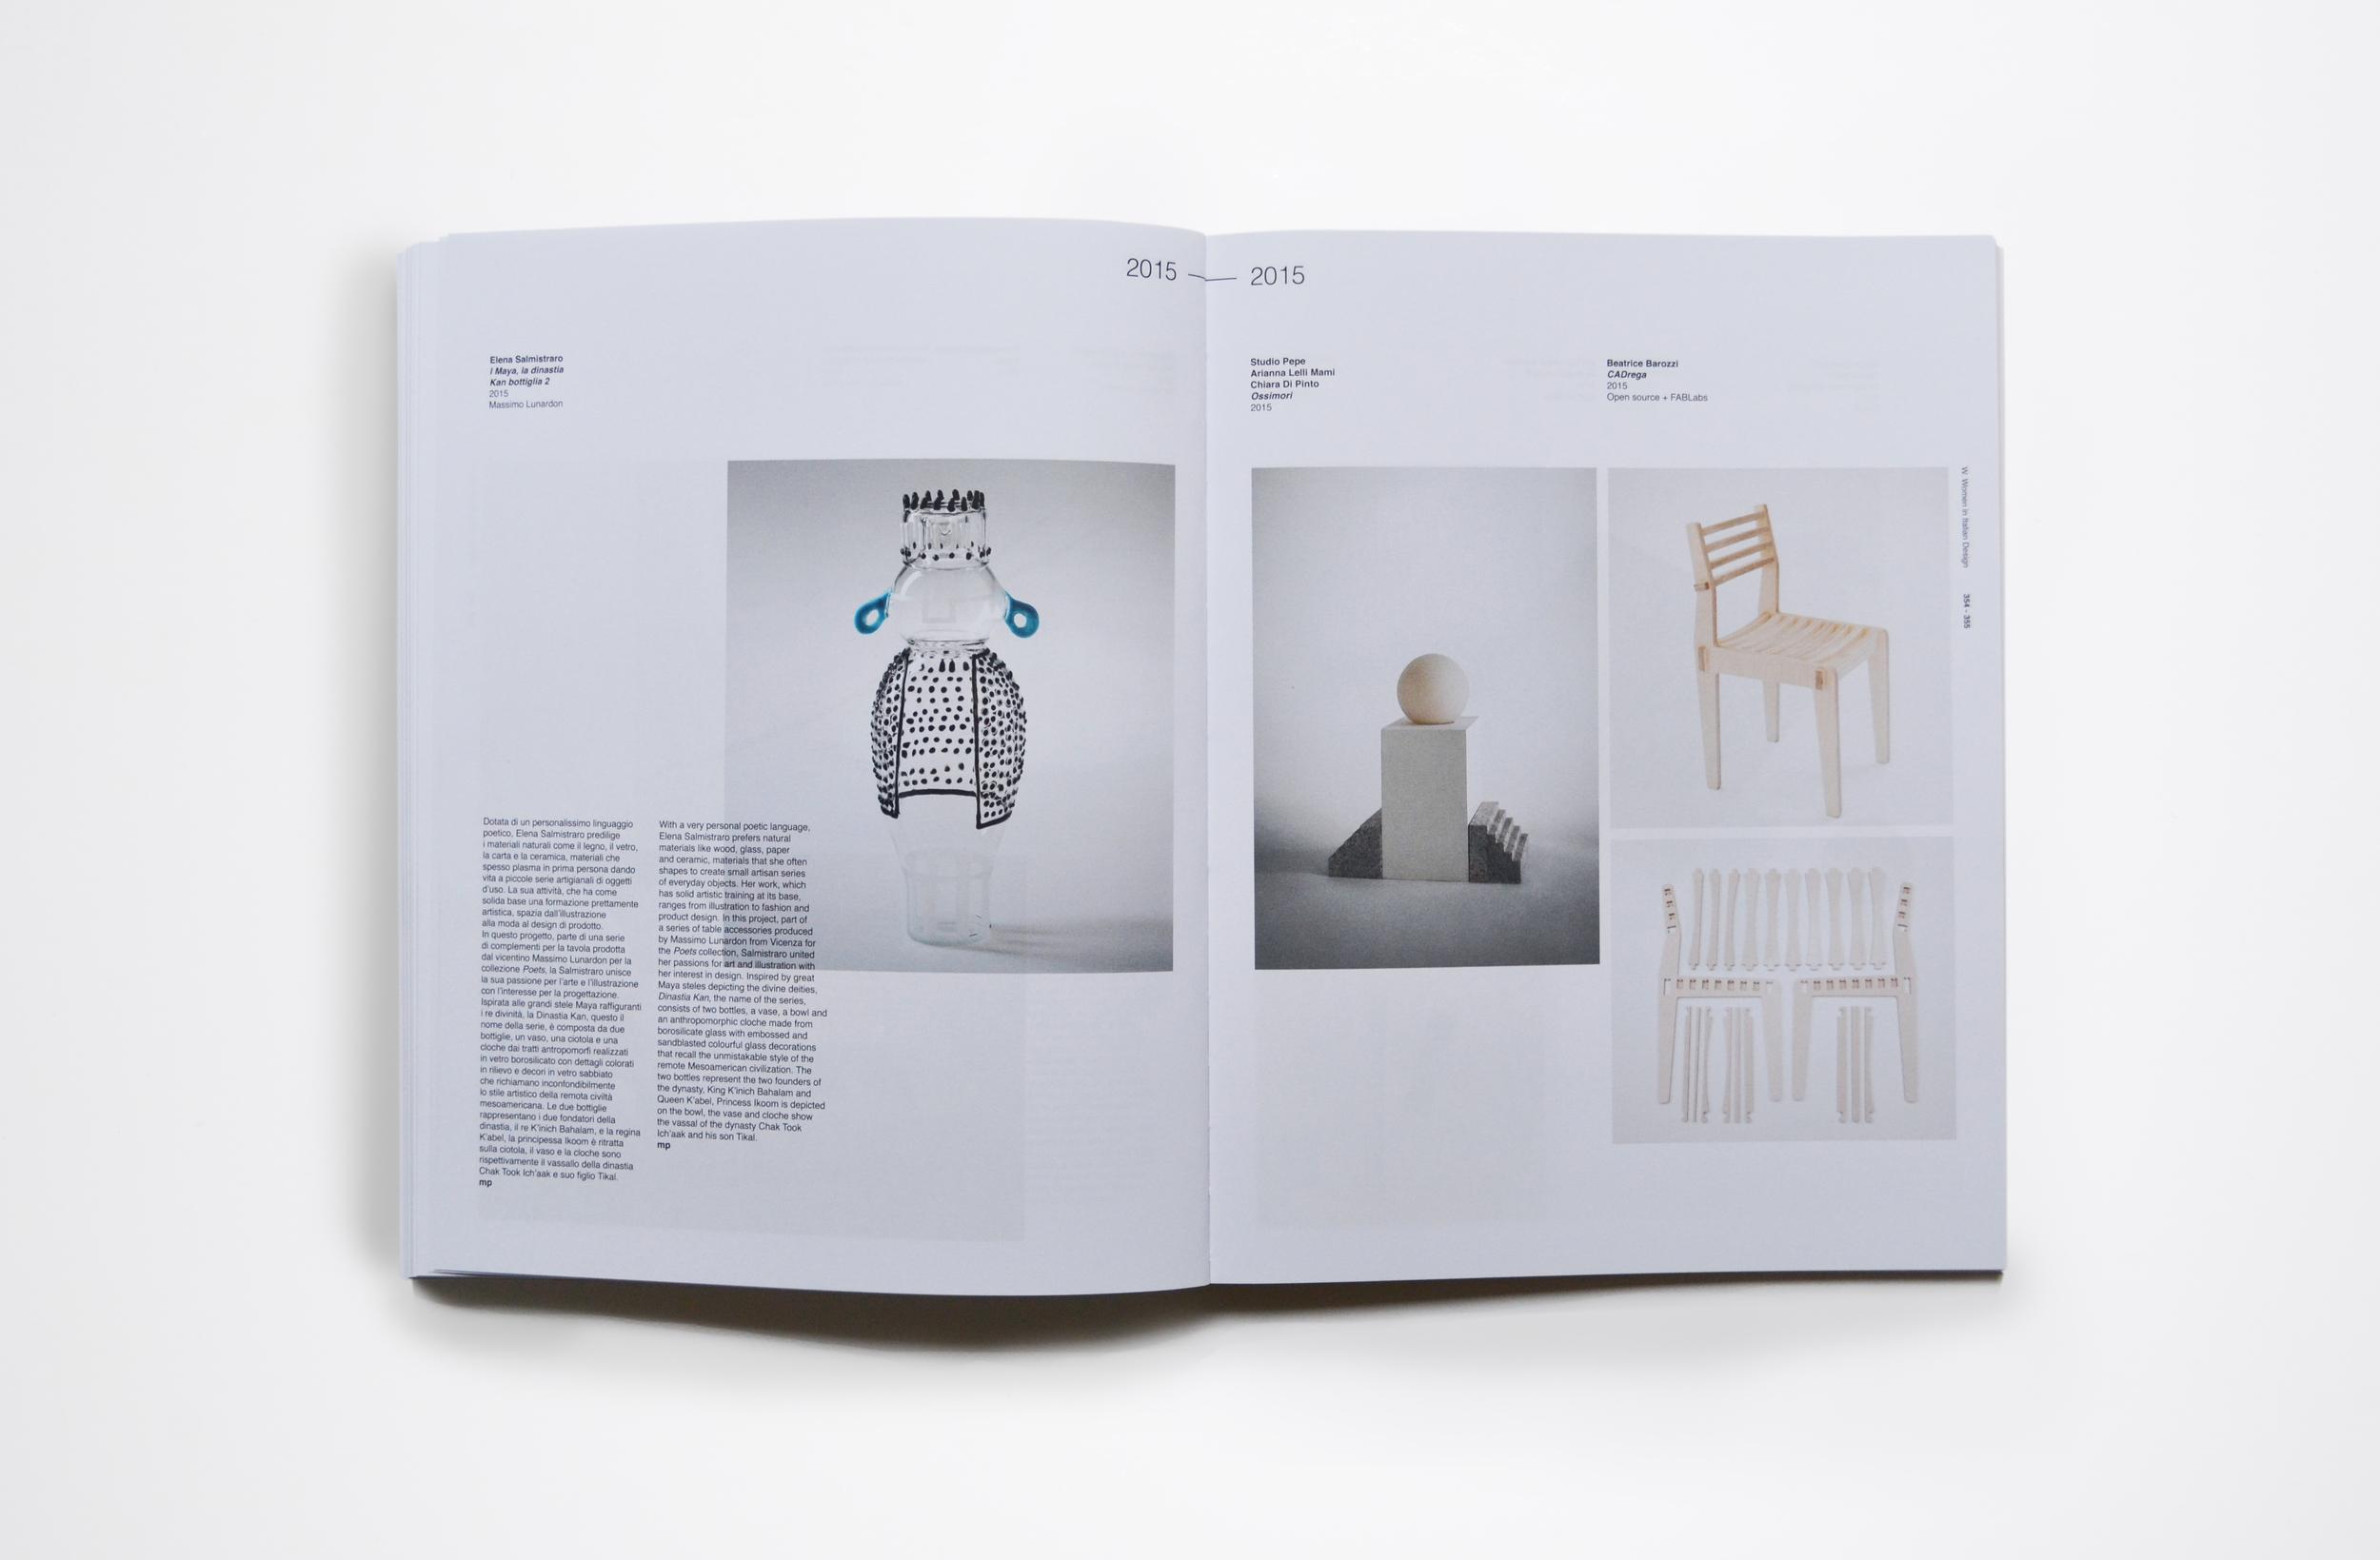 TriennaleDesignMuseum_Catalogue_WWomenInItalianDesign_03.jpg